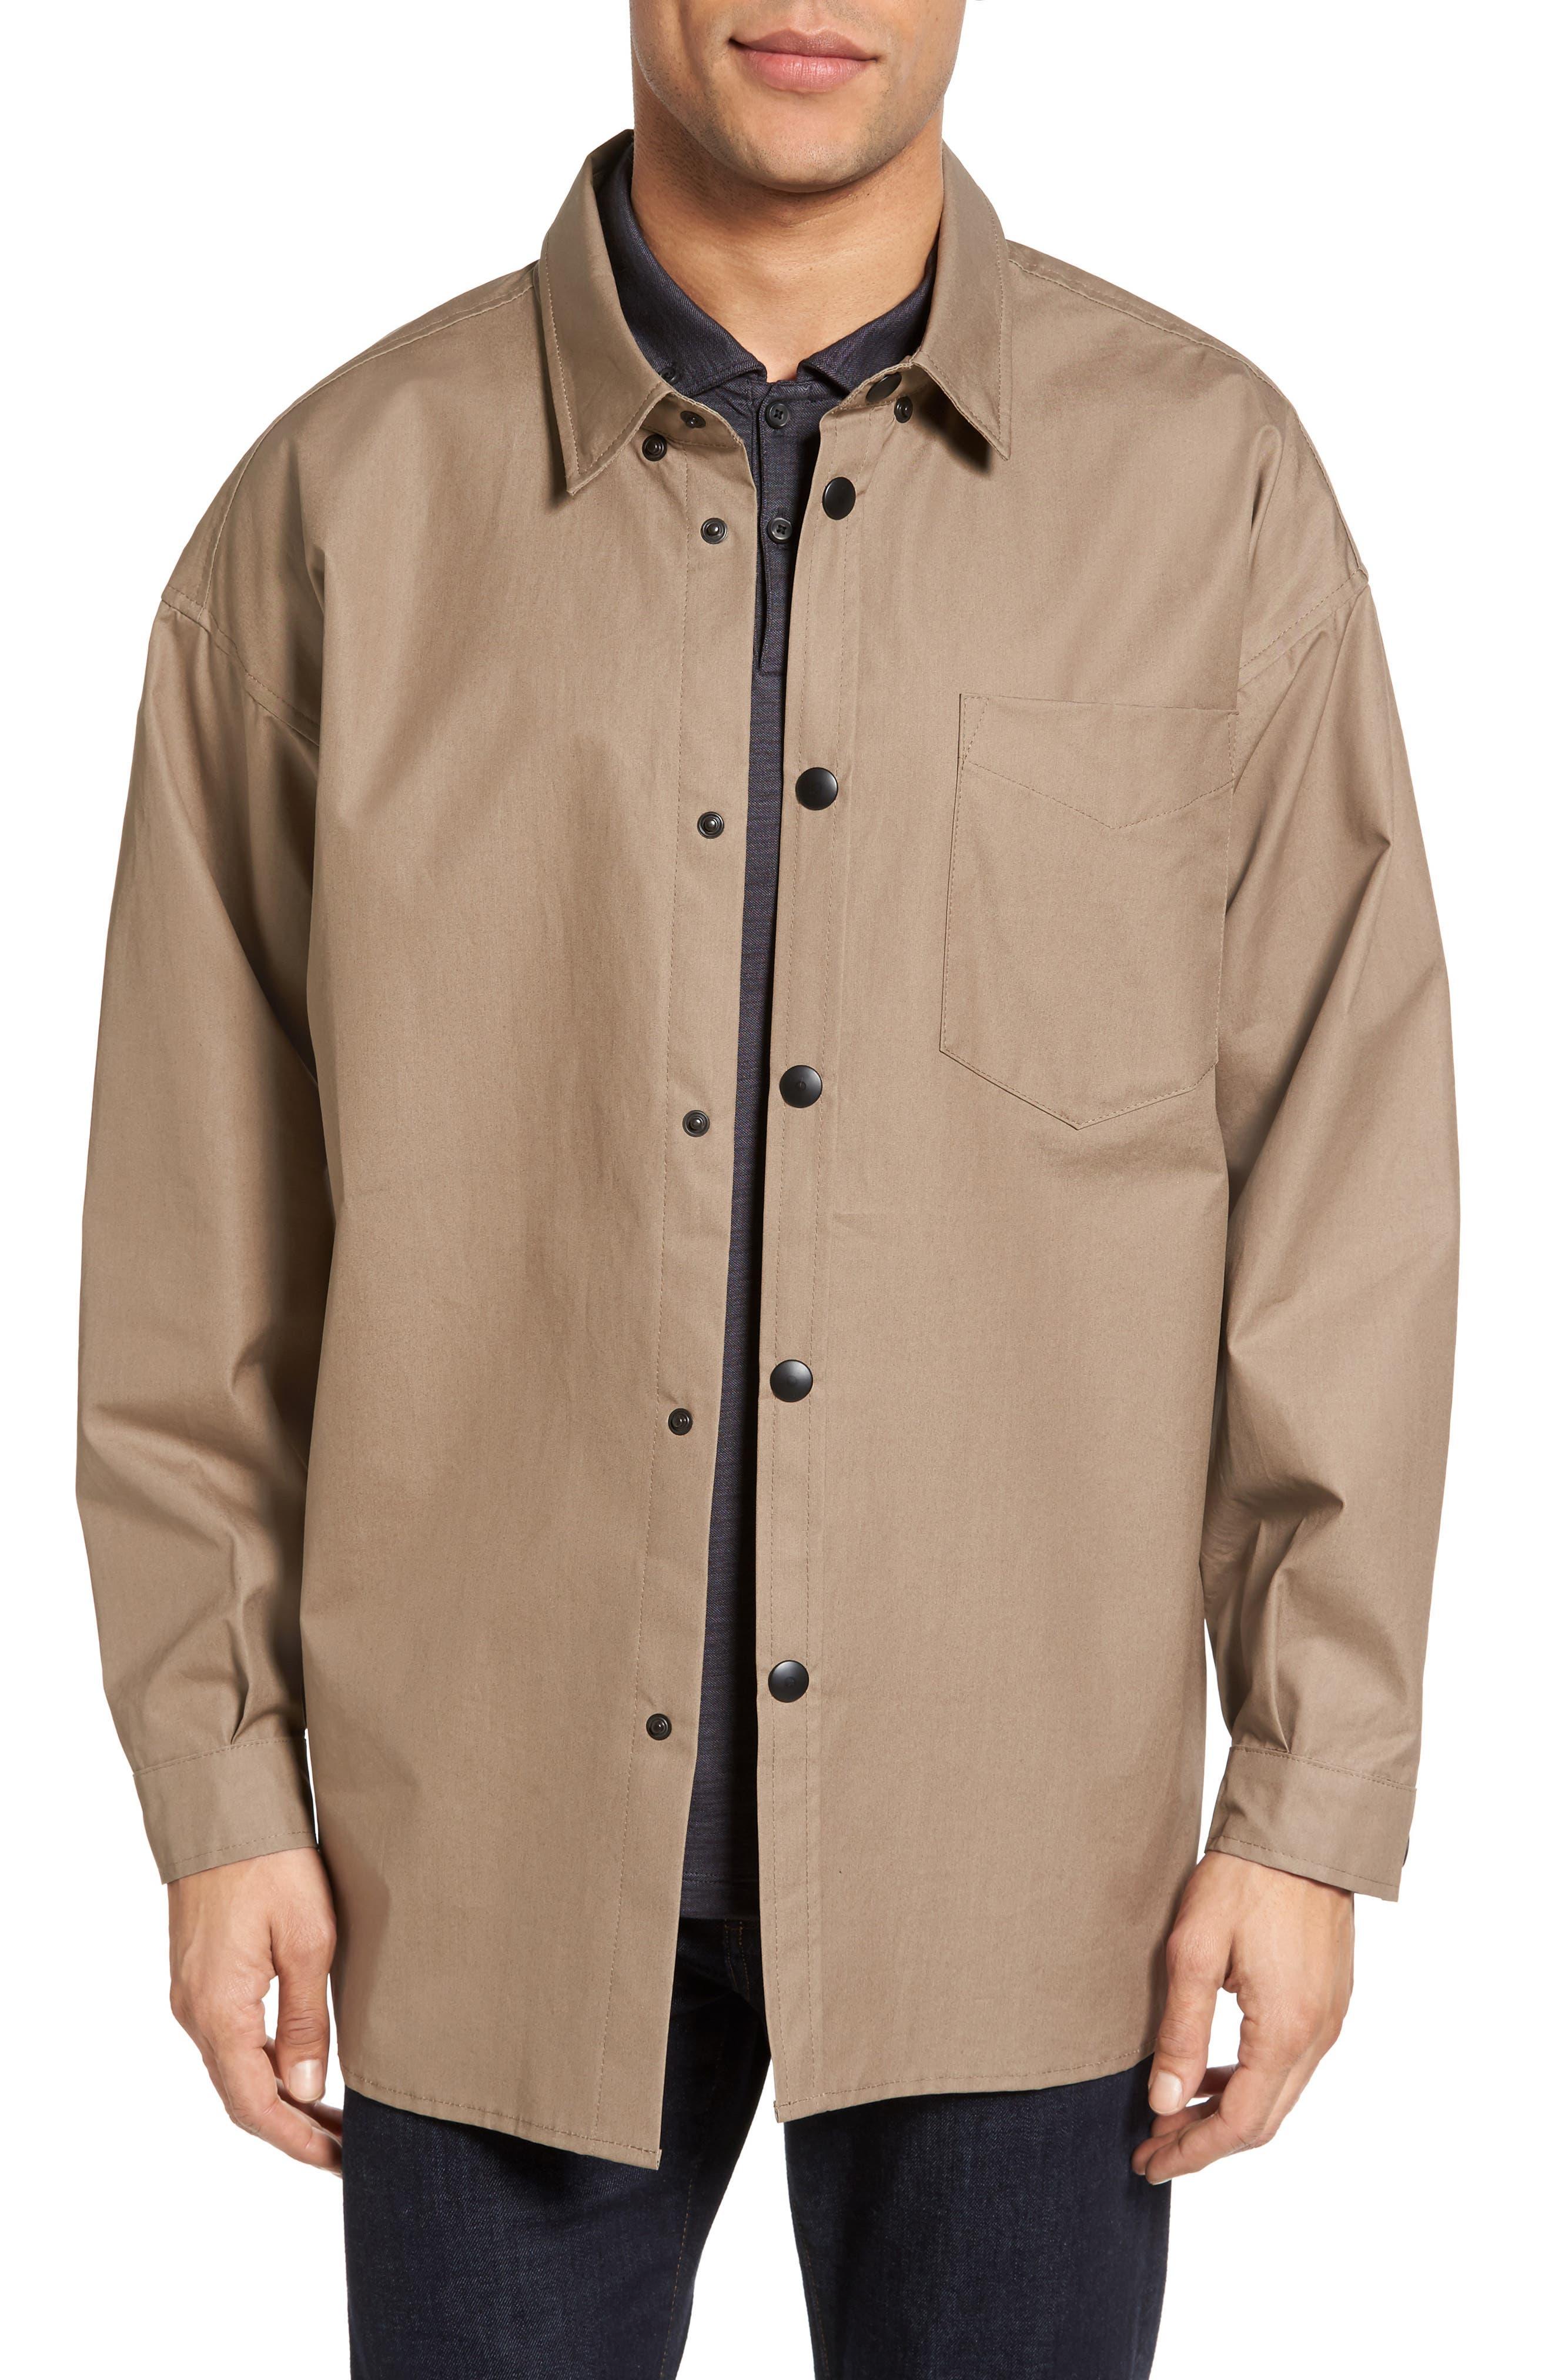 Lerum Relaxed Fit Shirt Jacket,                             Main thumbnail 2, color,